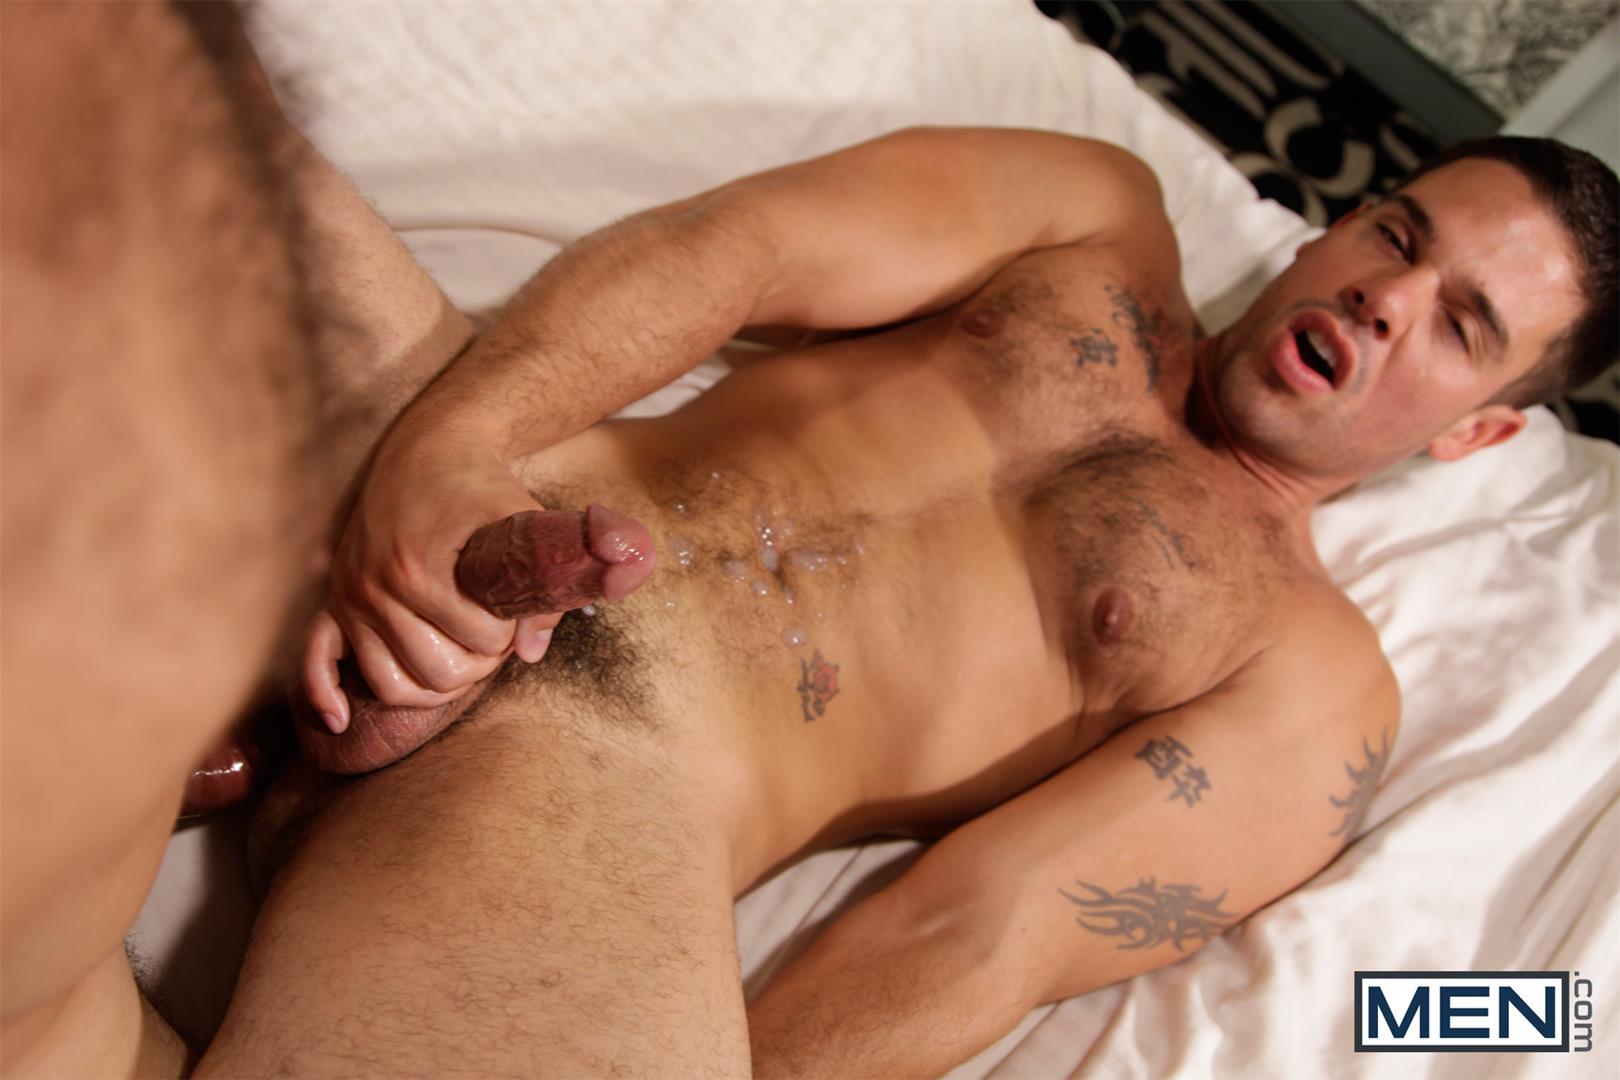 Men-Derek-Atlas-and-Jimmy-Fanz-Hairy-Muscle-Hunks-Big-Cocks-Fucking-Amateur-Gay-Porn-18 Hairy Muscle Hunk Derek Atlas Bottoms For Big Cock Jimmy Fanz